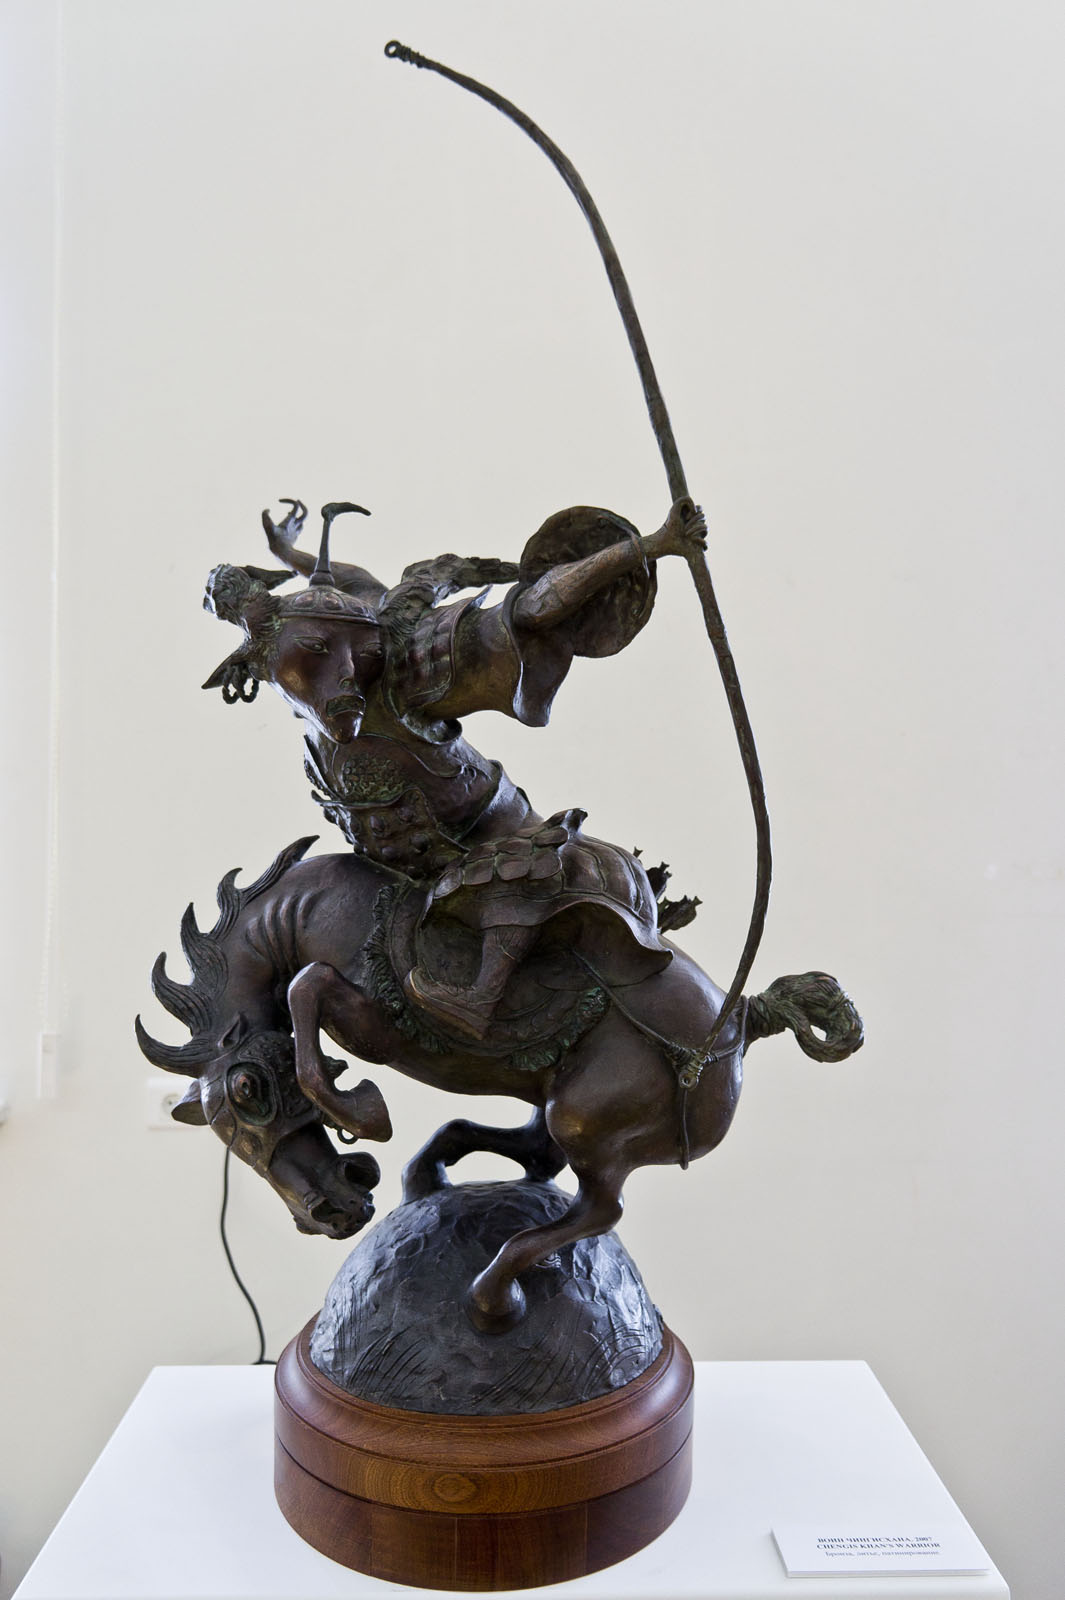 Фото №79179. Воин Чингисхана. 2007. Даши Намдаков